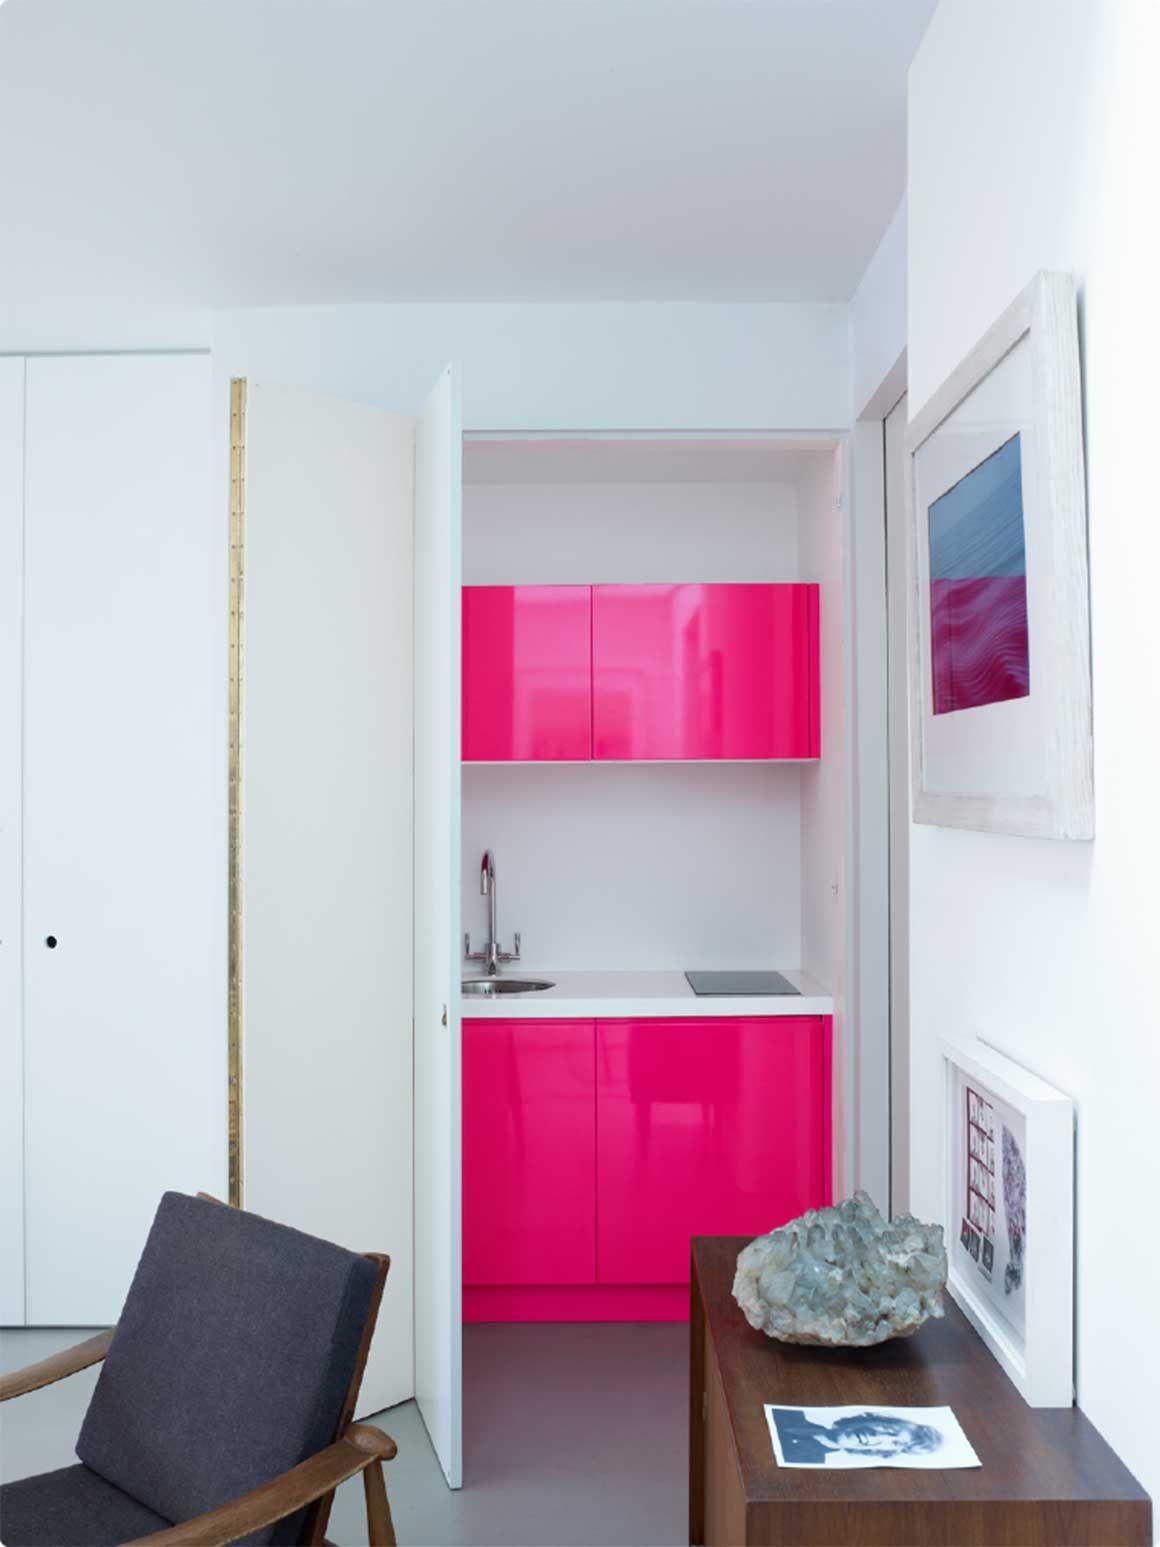 neon pink kitchen interior home kitchen colors on kitchen decor pink id=56341